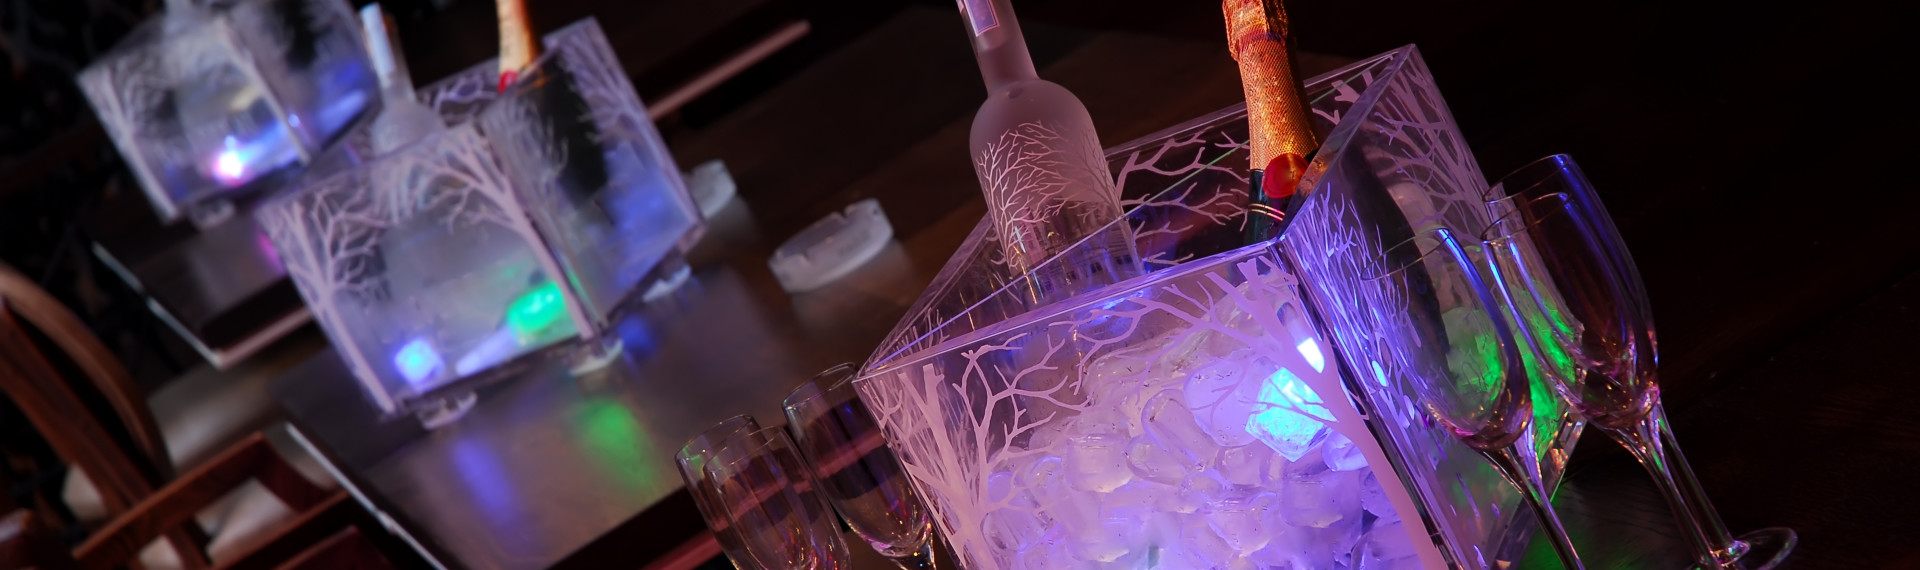 Club VIP Table